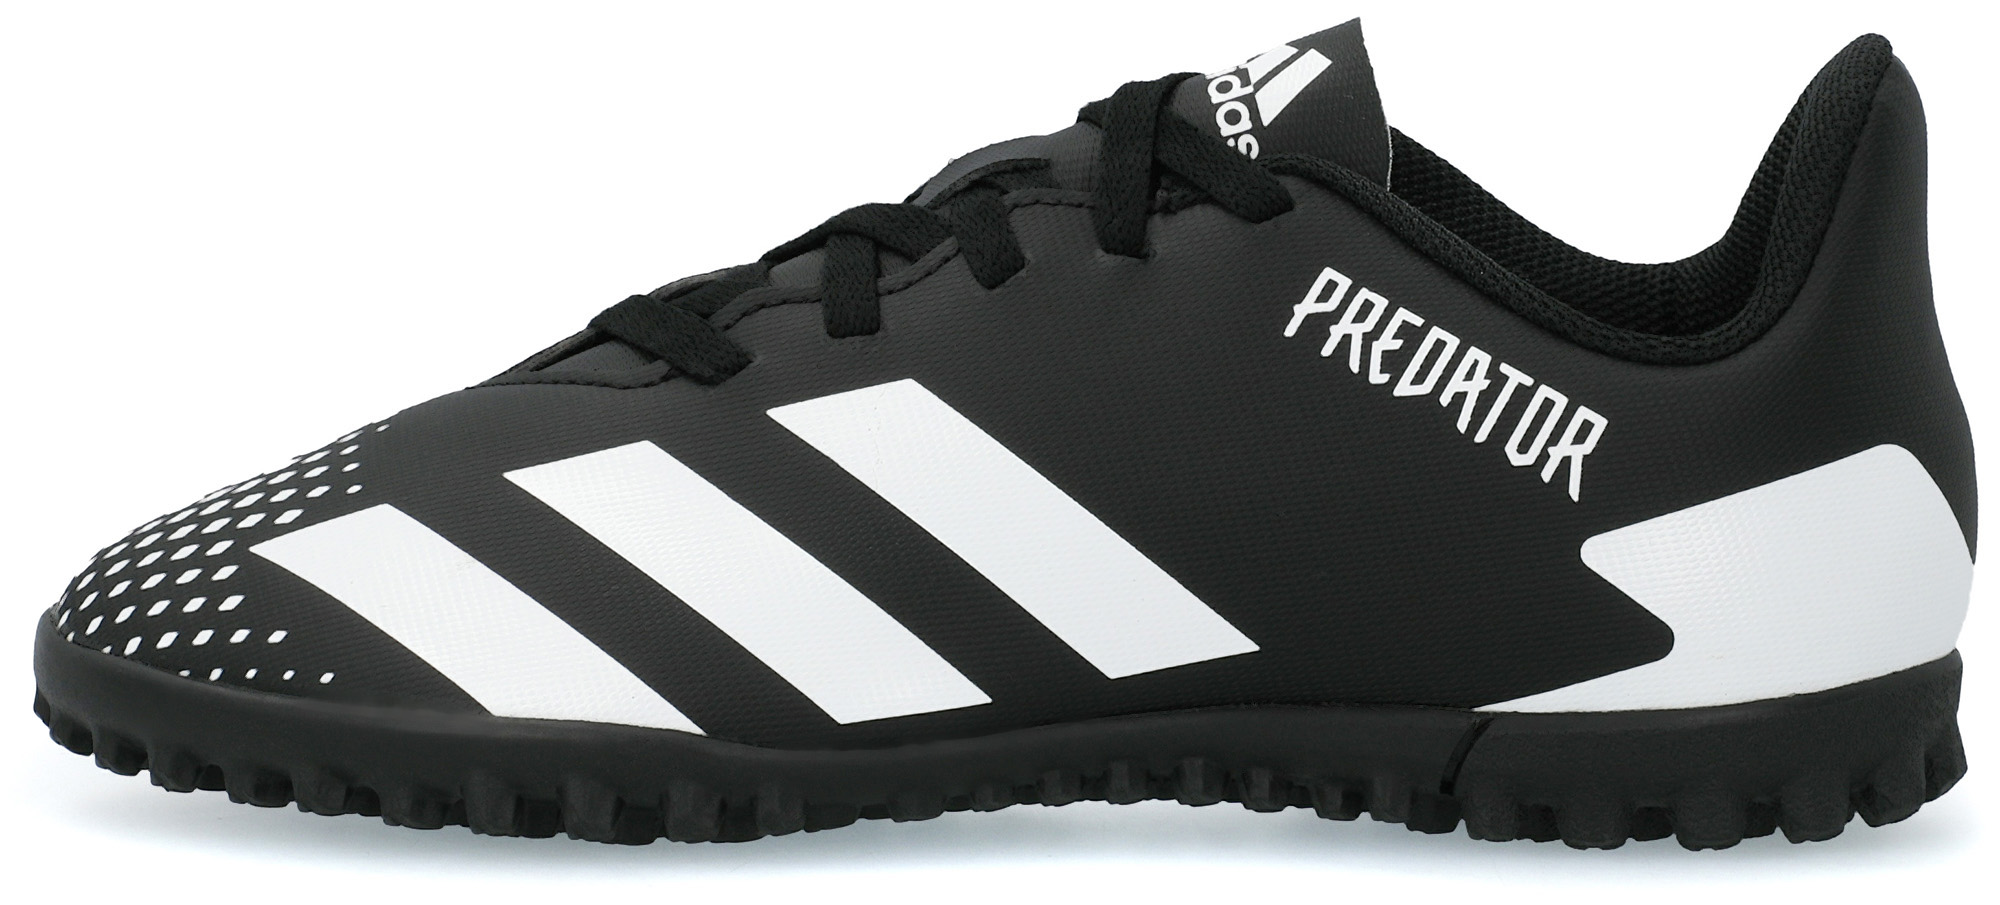 Бутсы для мальчиков adidas Predator 20.4 TF J, размер 37 adidas бутсы для мальчиков adidas copa 20 3 fg j размер 37